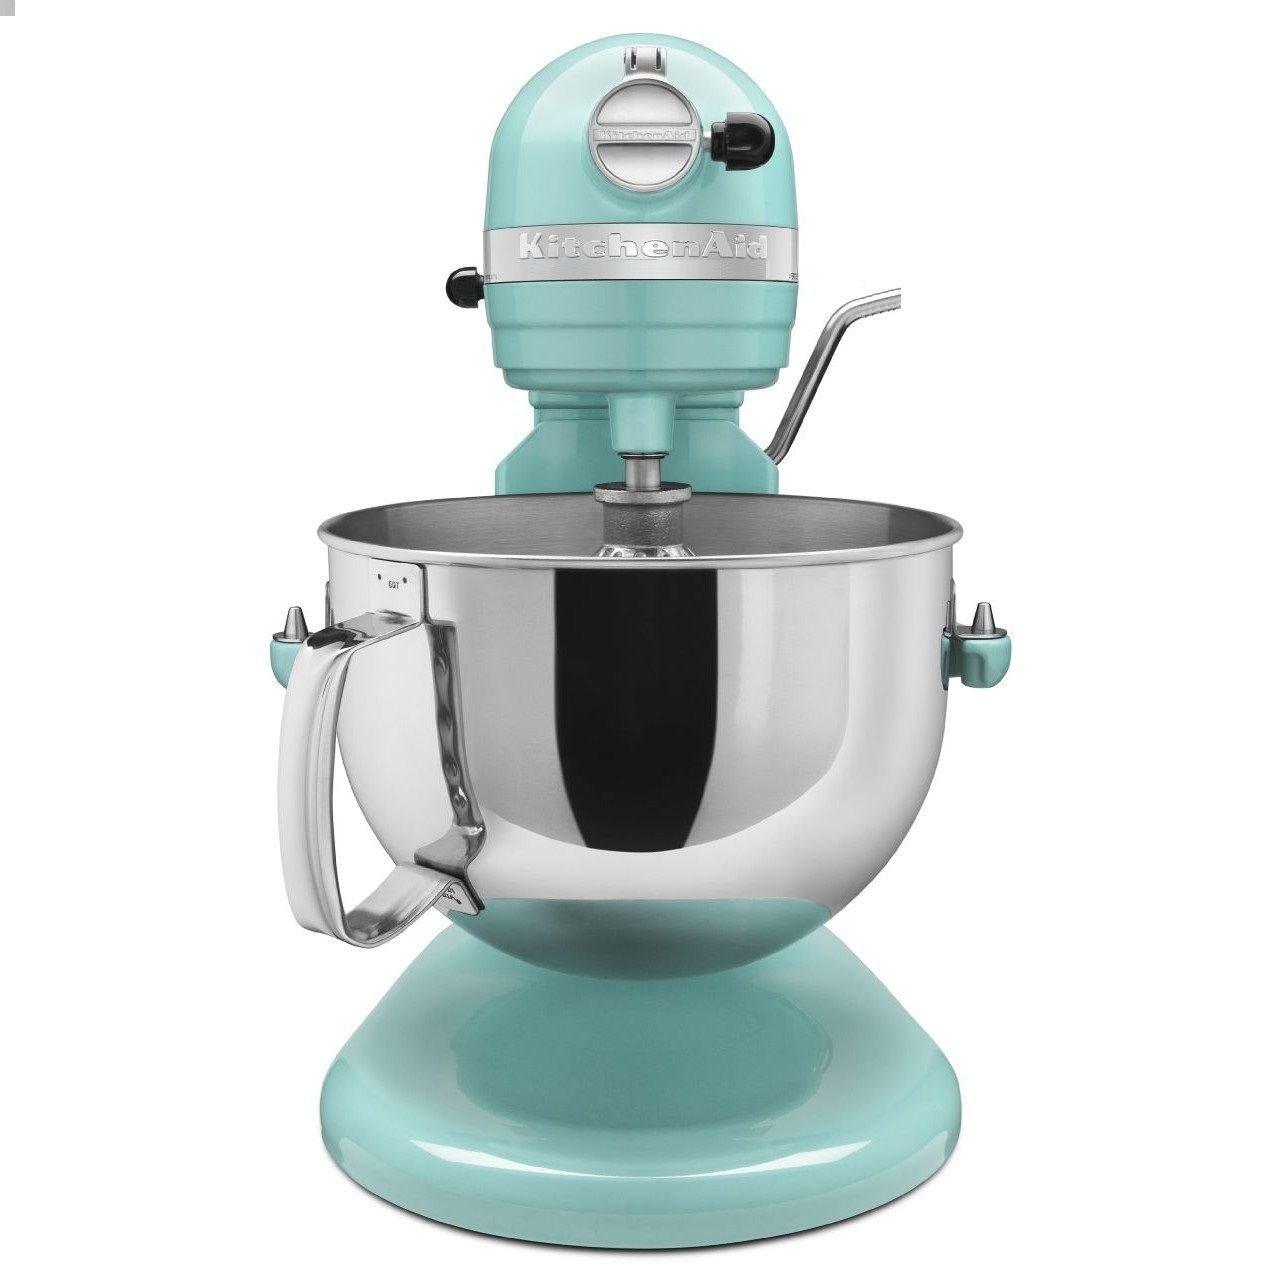 Amazon.com: NEW Kitchenaid Stand Mixer 475 -W 10-Speed 5-Quart ...